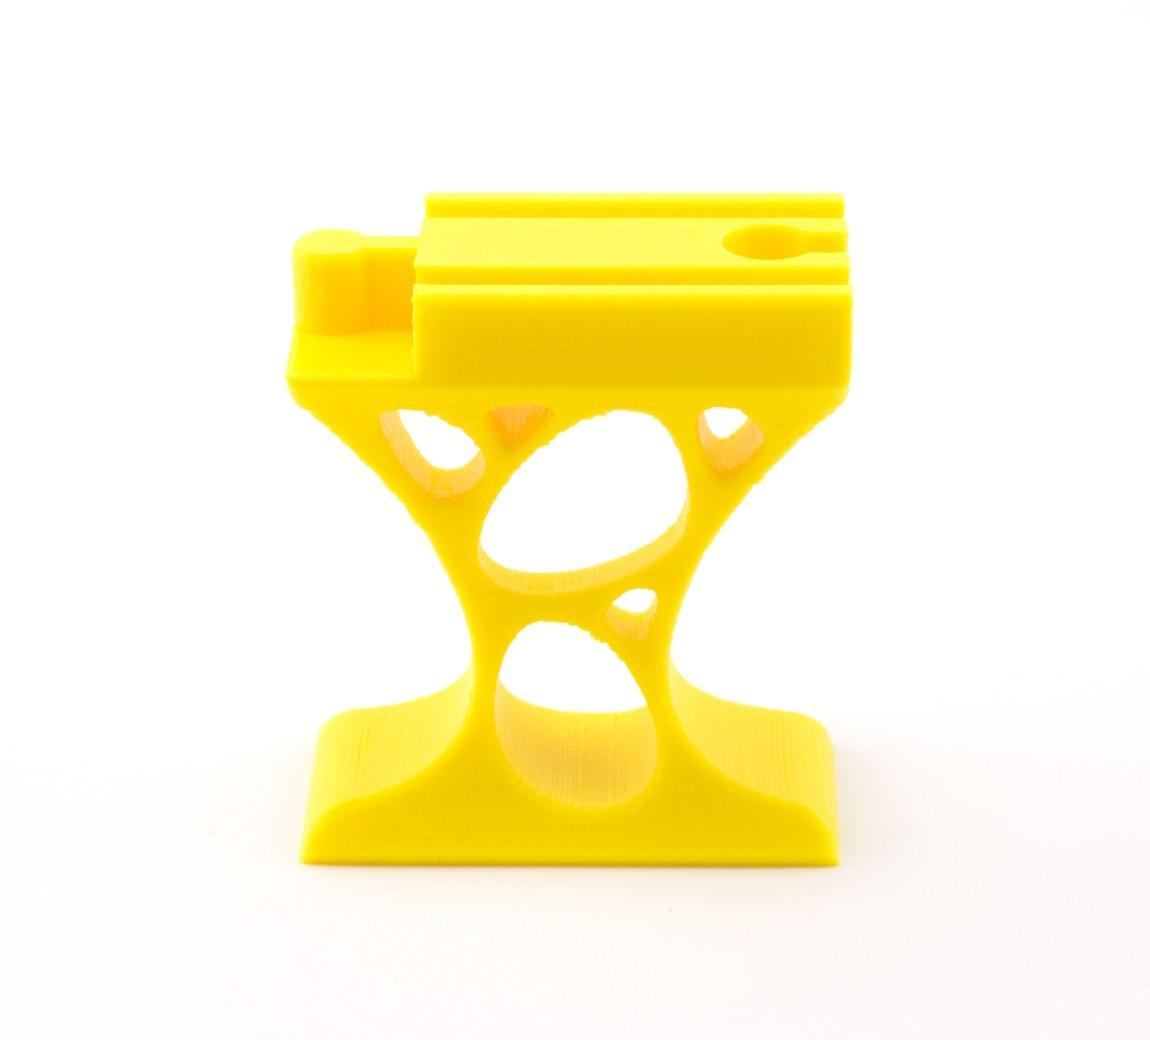 91cb4f62ceb4627f4039d91b0e40adb8_1449686675767_12.2.15-product-shoot-117.jpg Download free STL file Toy Train Tracks • 3D printer design, FerryTeacher